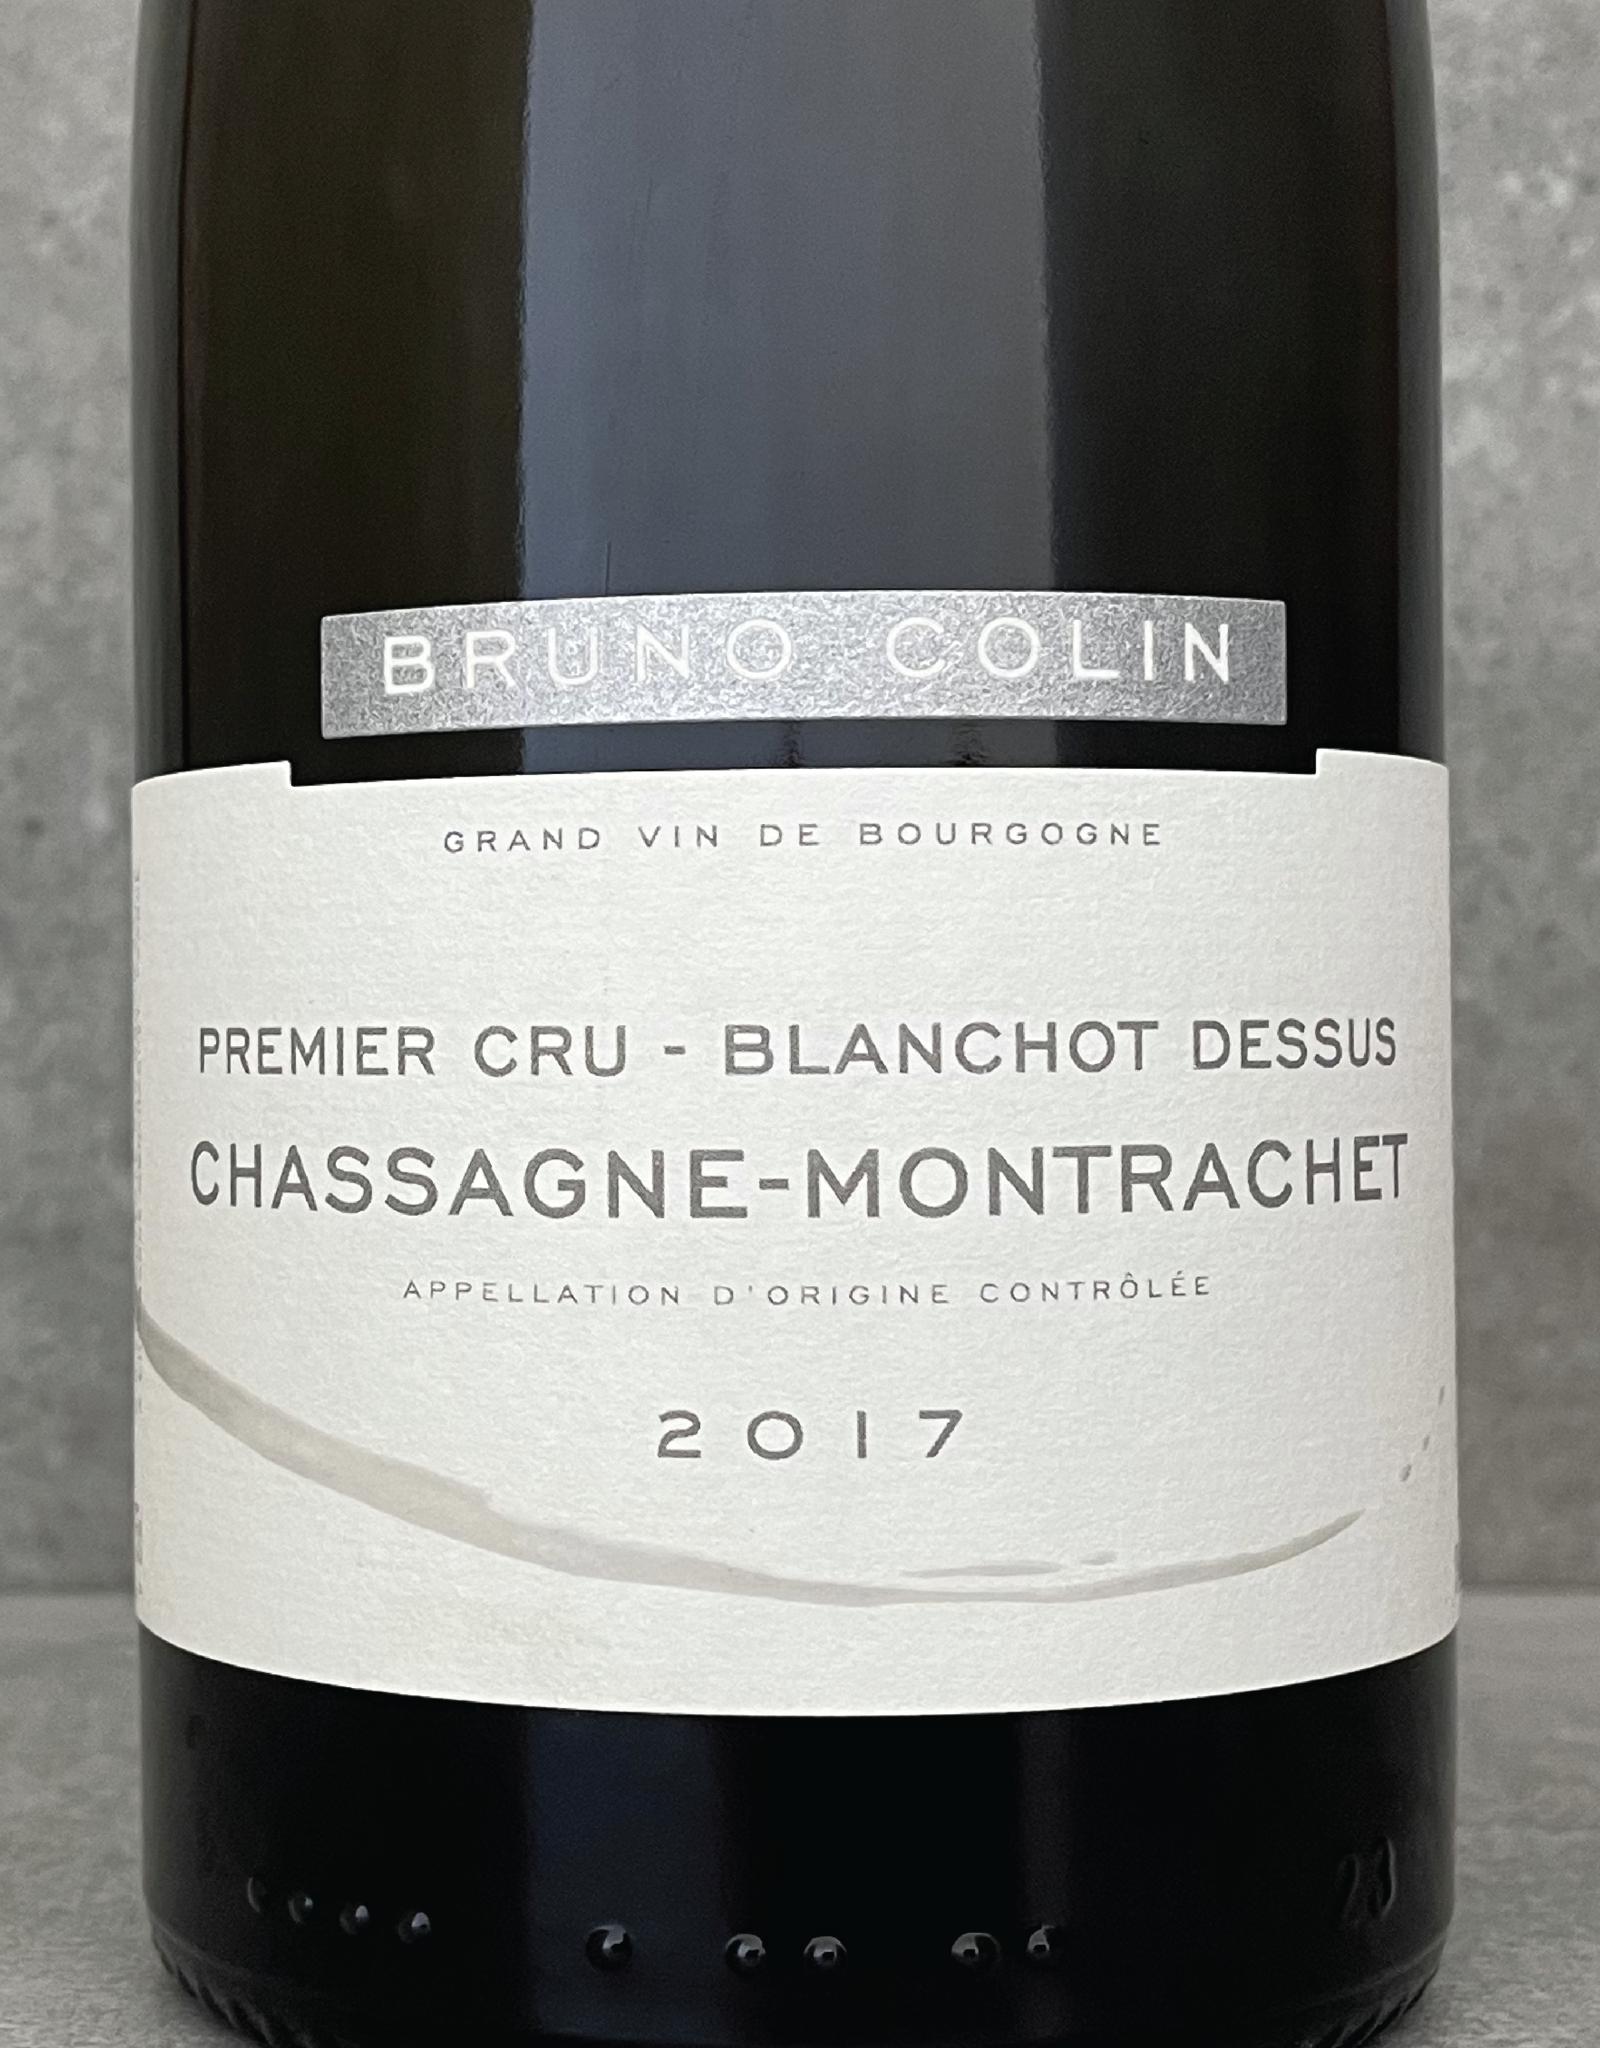 Bruno Colin Chassagne Montrachet 1er Cru Blanchot au dessus 2018